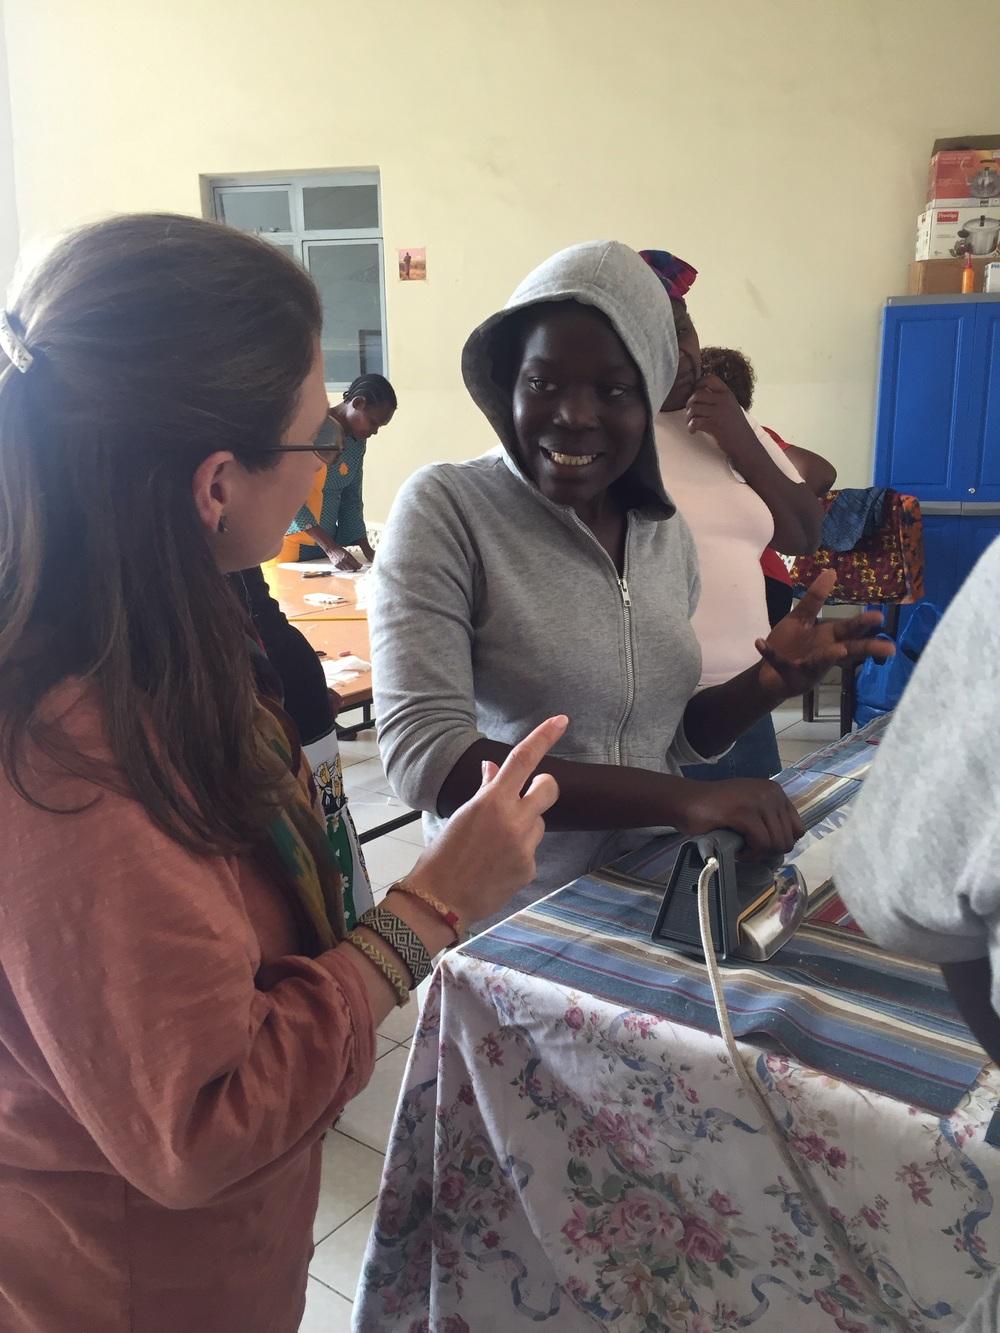 Learning to count to ten in Swahili ... Moja, mbili, tatu, nne, tano, sita, saba, nane, tisa, kumi!